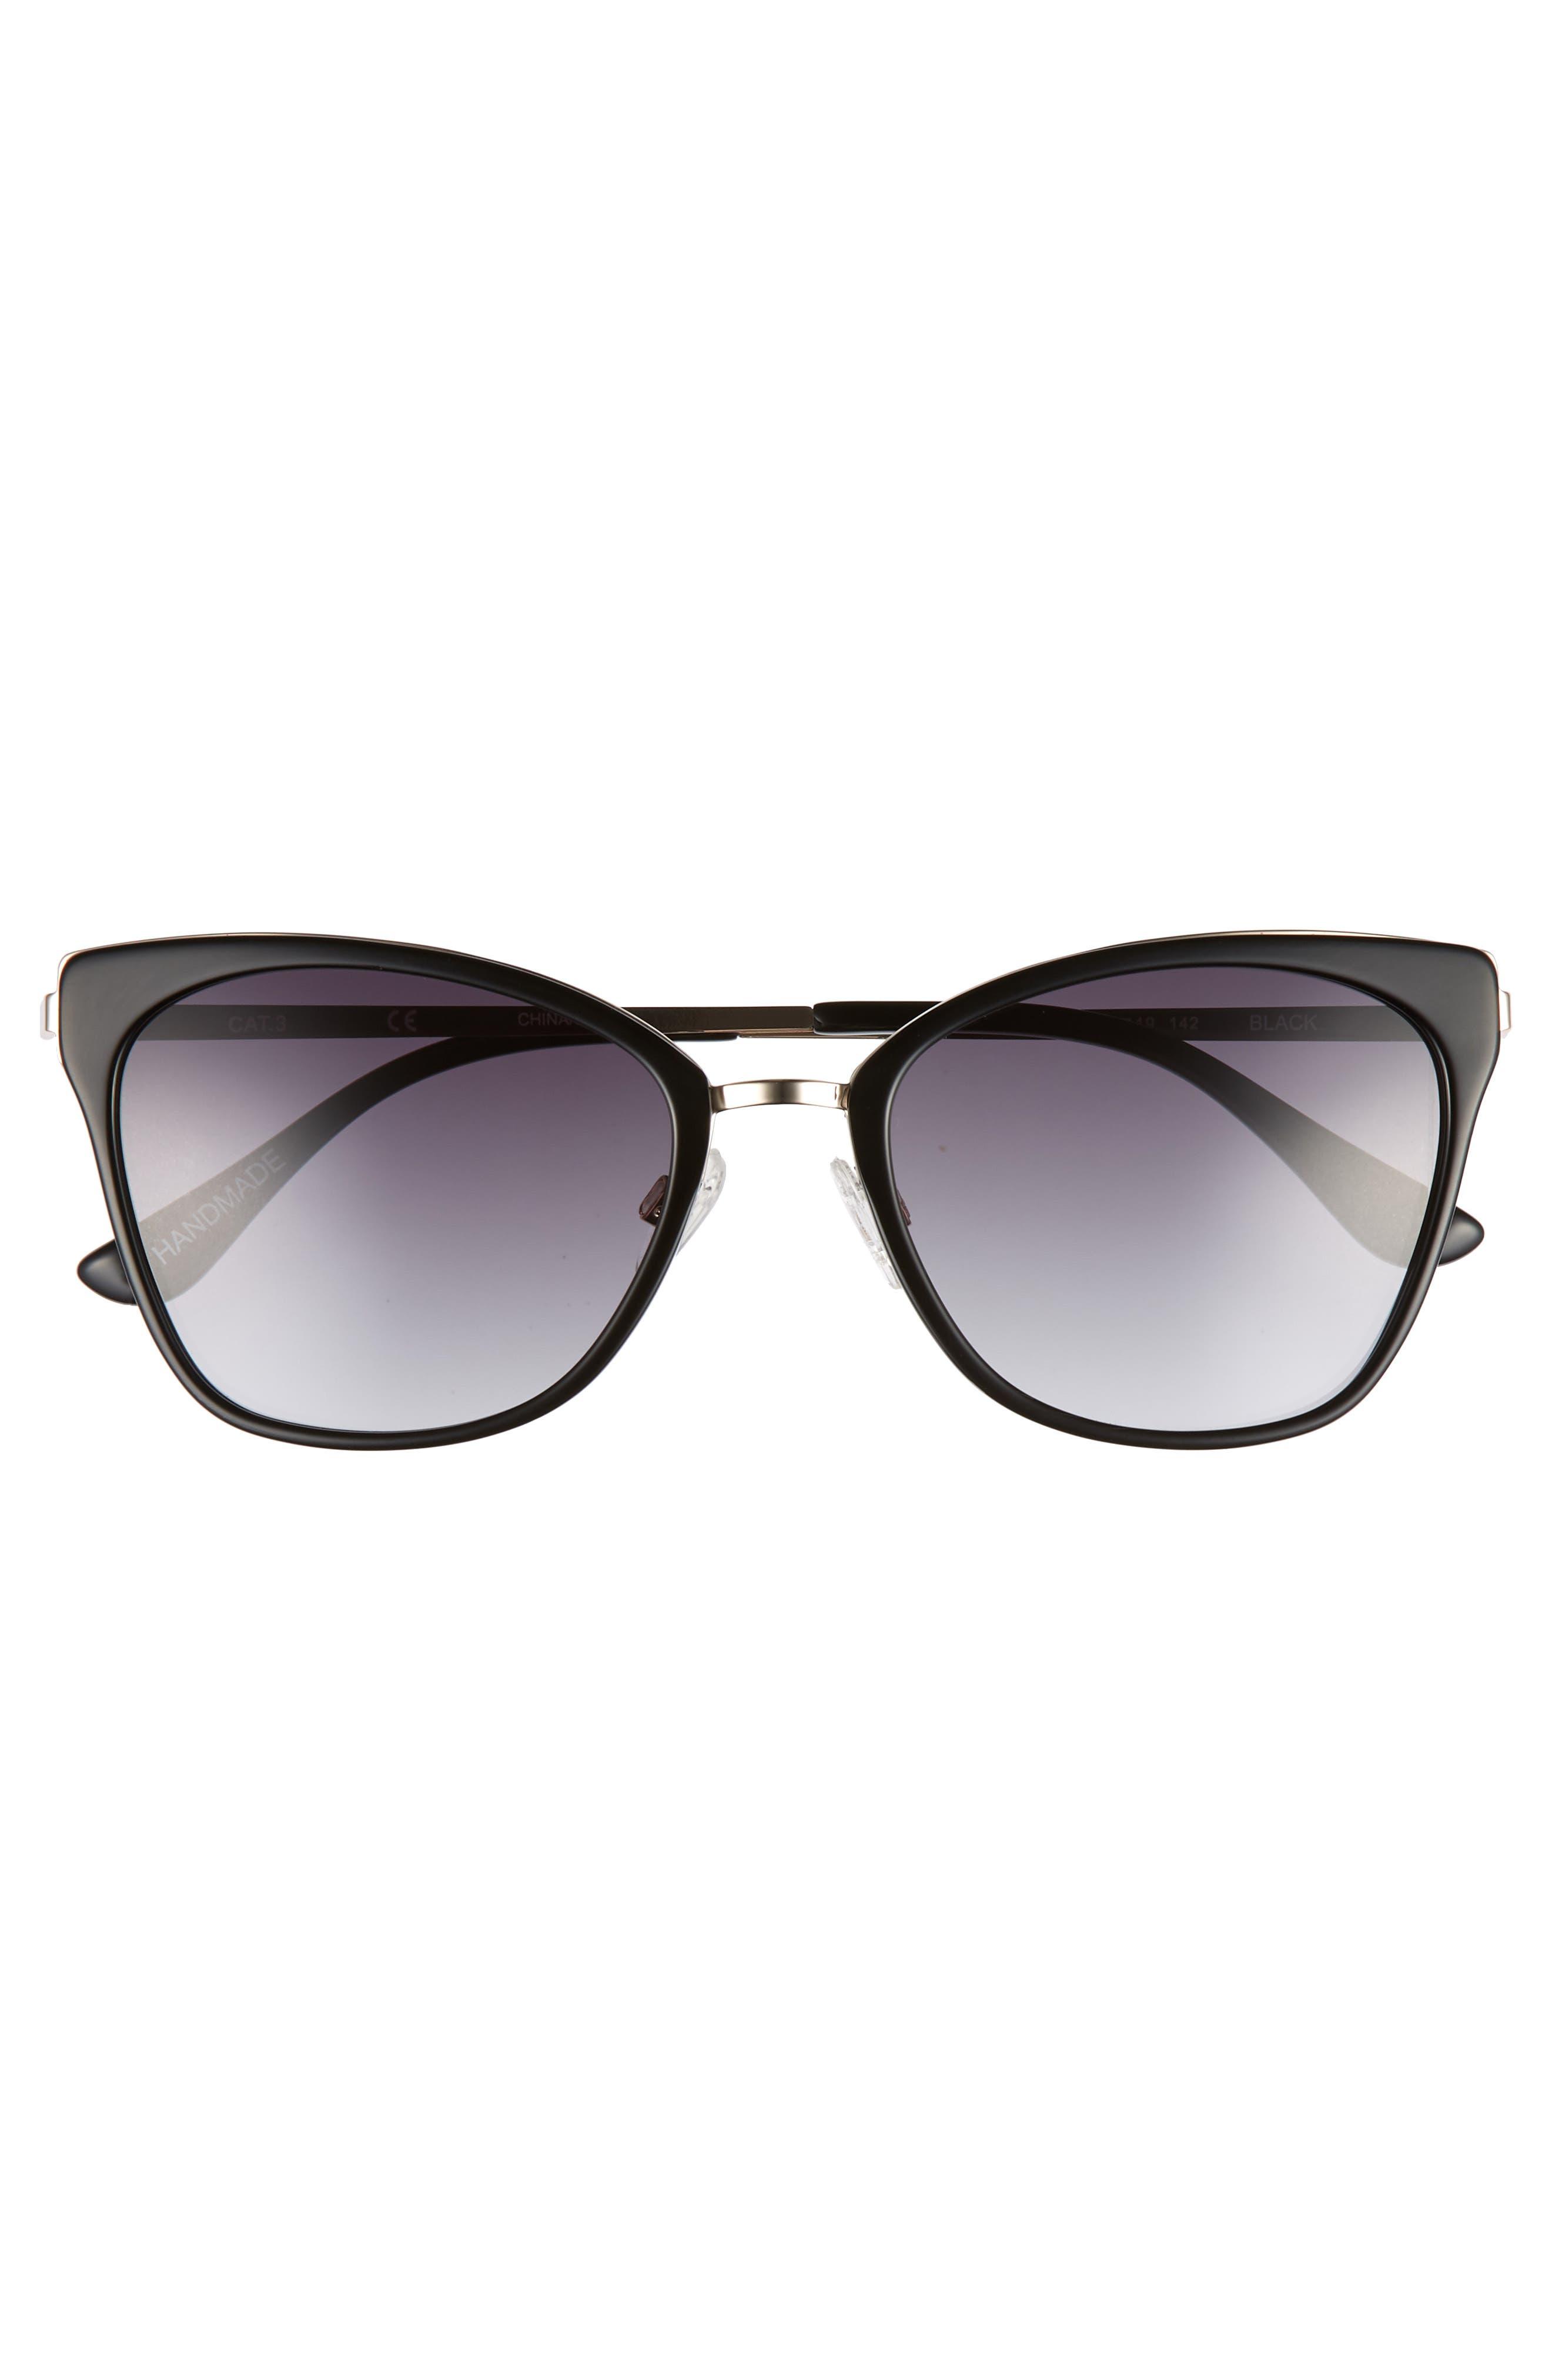 Origami 55mm Cat Eye Sunglasses,                             Alternate thumbnail 2, color,                             Black